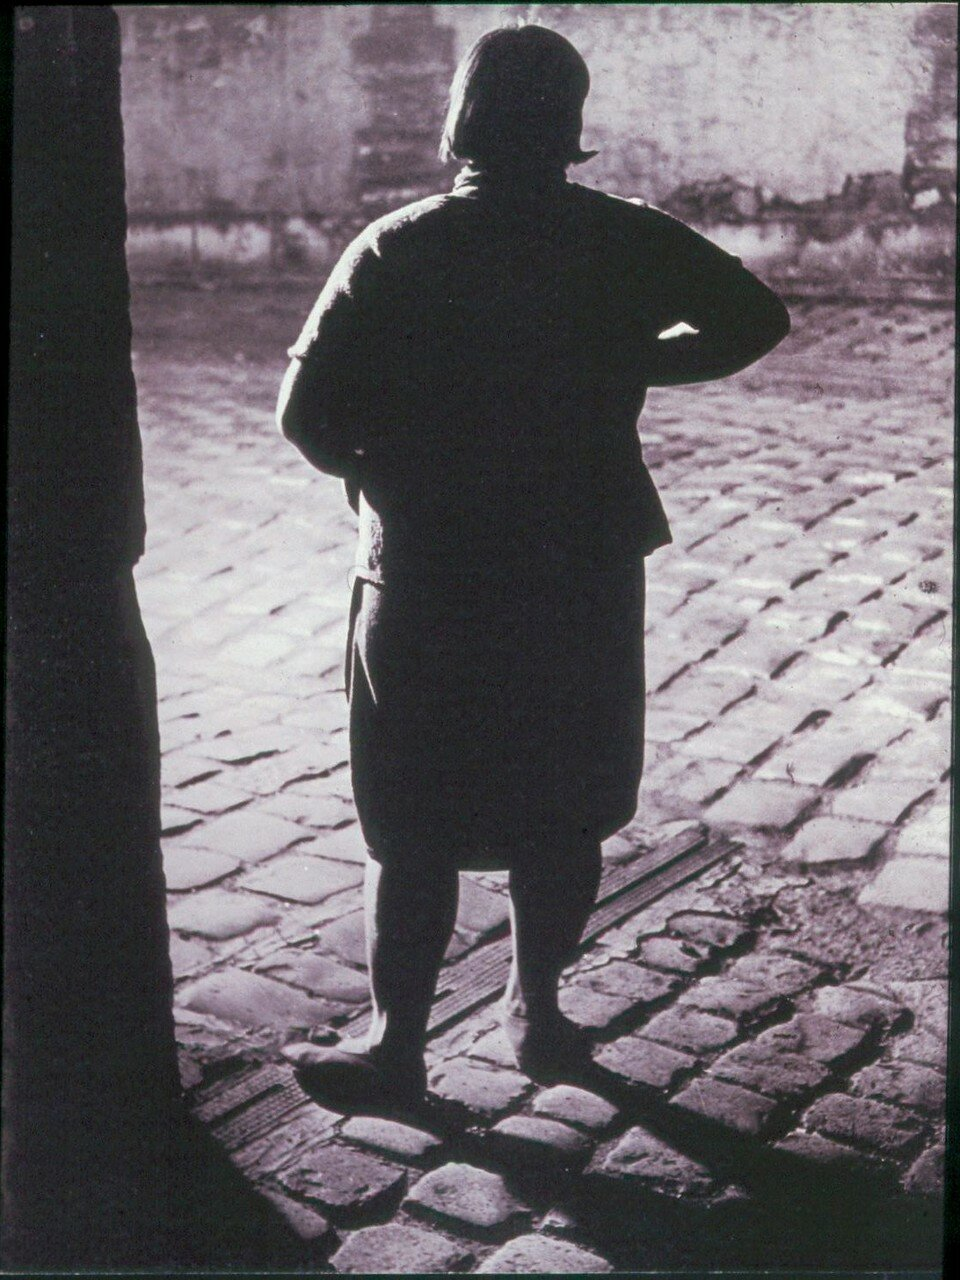 1932. Проститутка возле площади Италии (вид сзади)